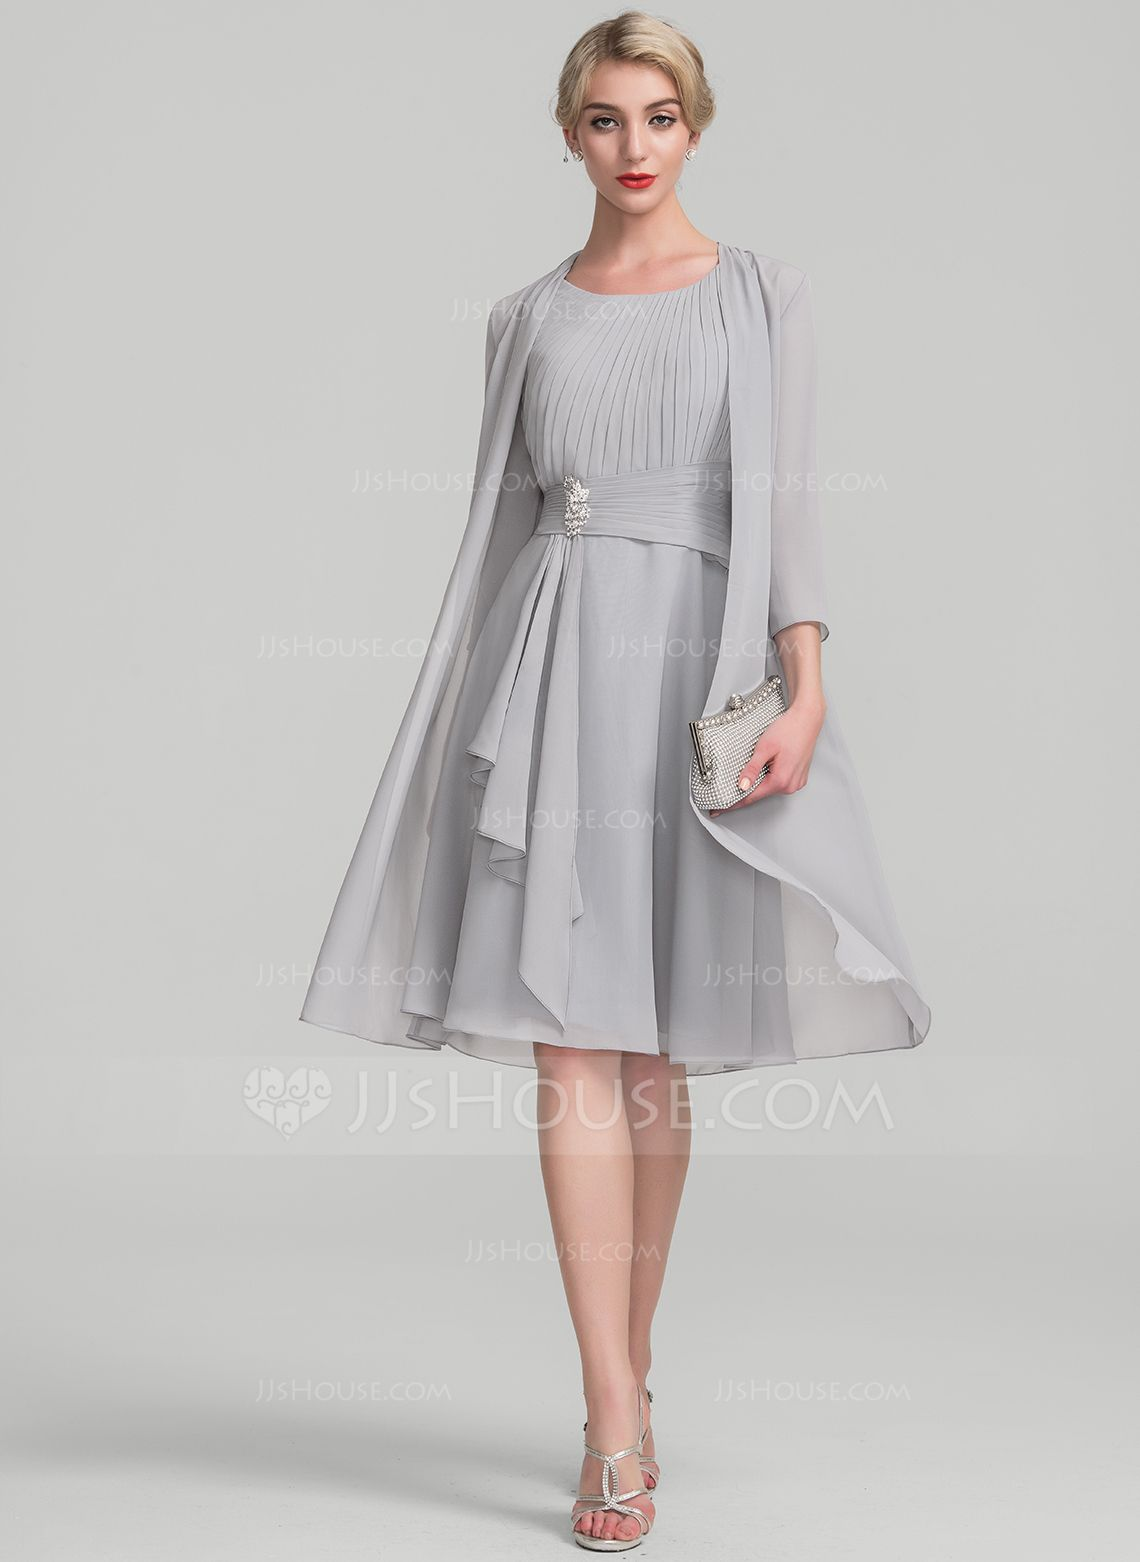 Us 110 00 A Line Princess Scoop Neck Knee Length Chiffon Mother